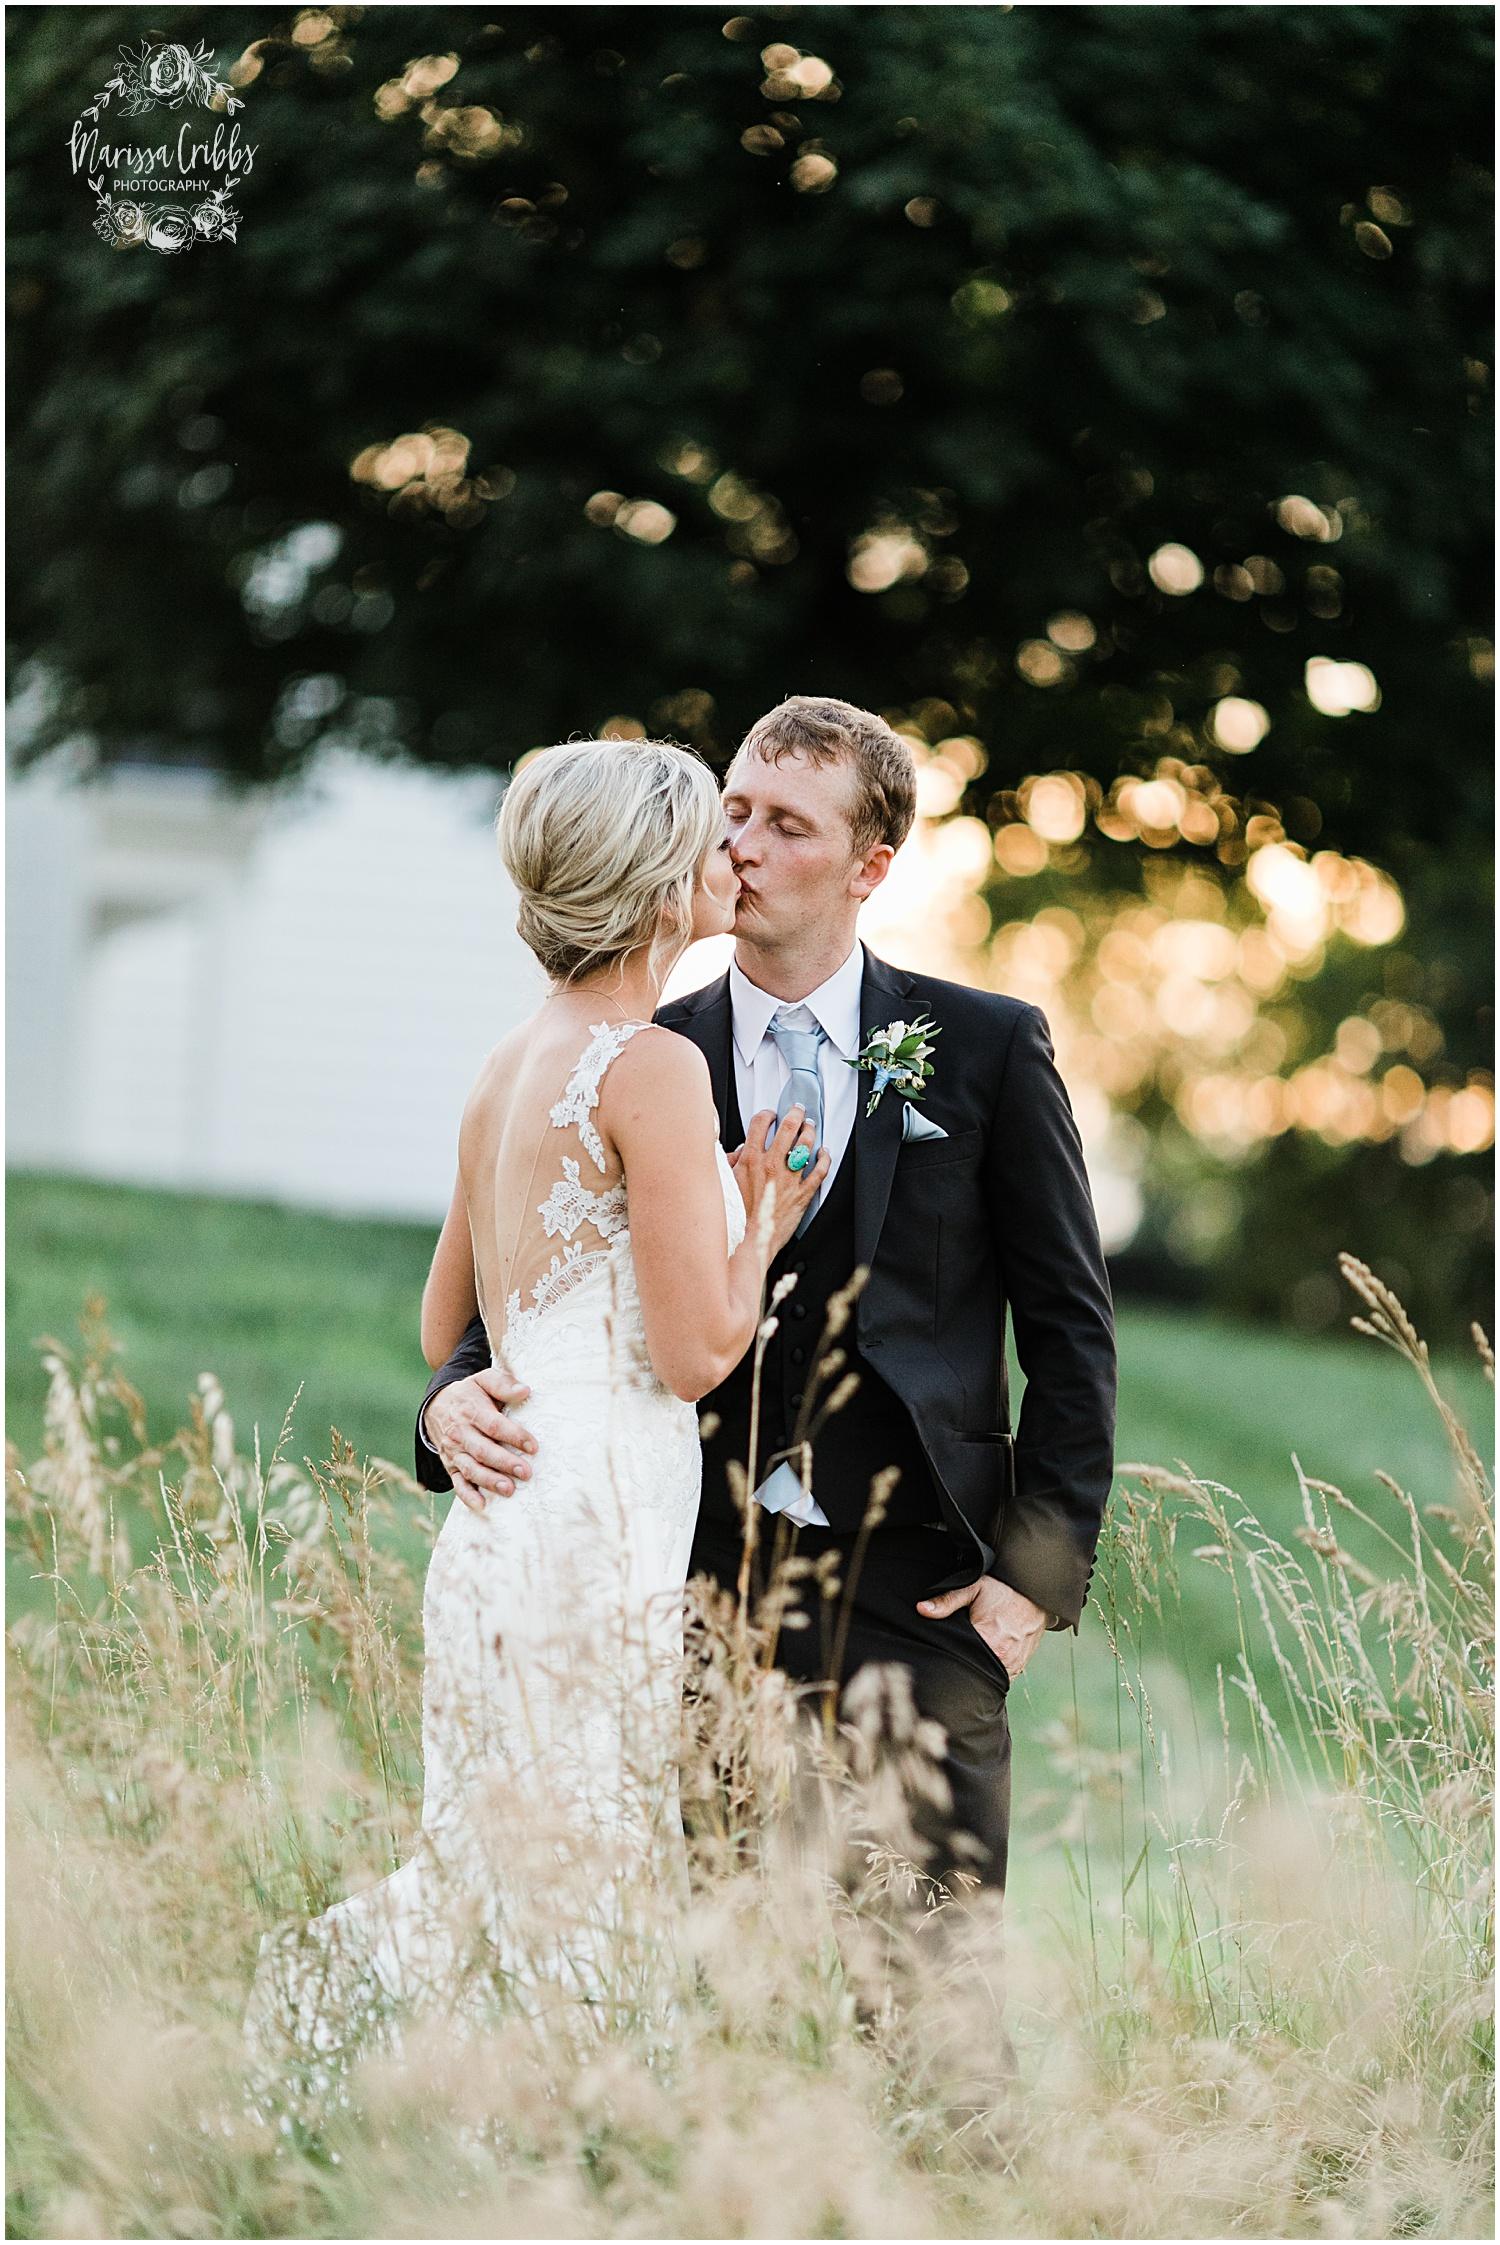 CHELSEA & BEN MARRIED BLOG  | MARISSA CRIBBS PHOTOGRAPHY_8640.jpg